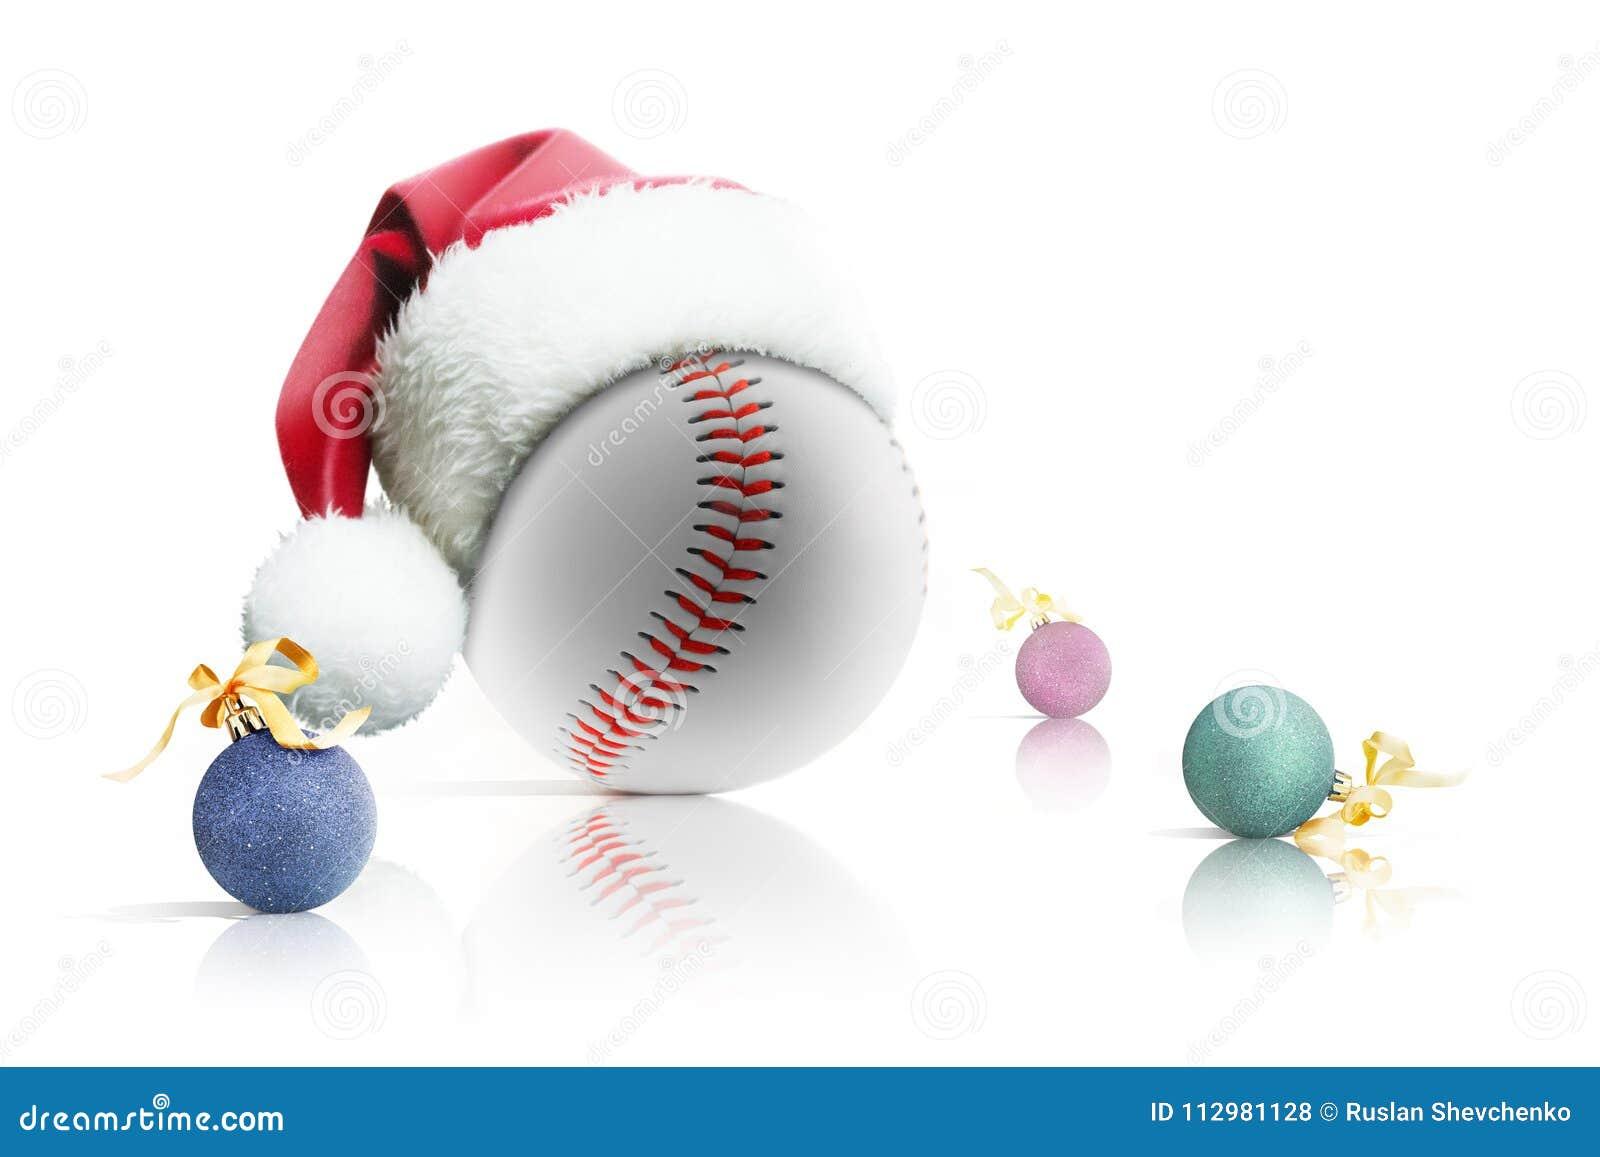 Christmas baseball. Baseball ball in Santa hat Christmas toys on white background. Isolated